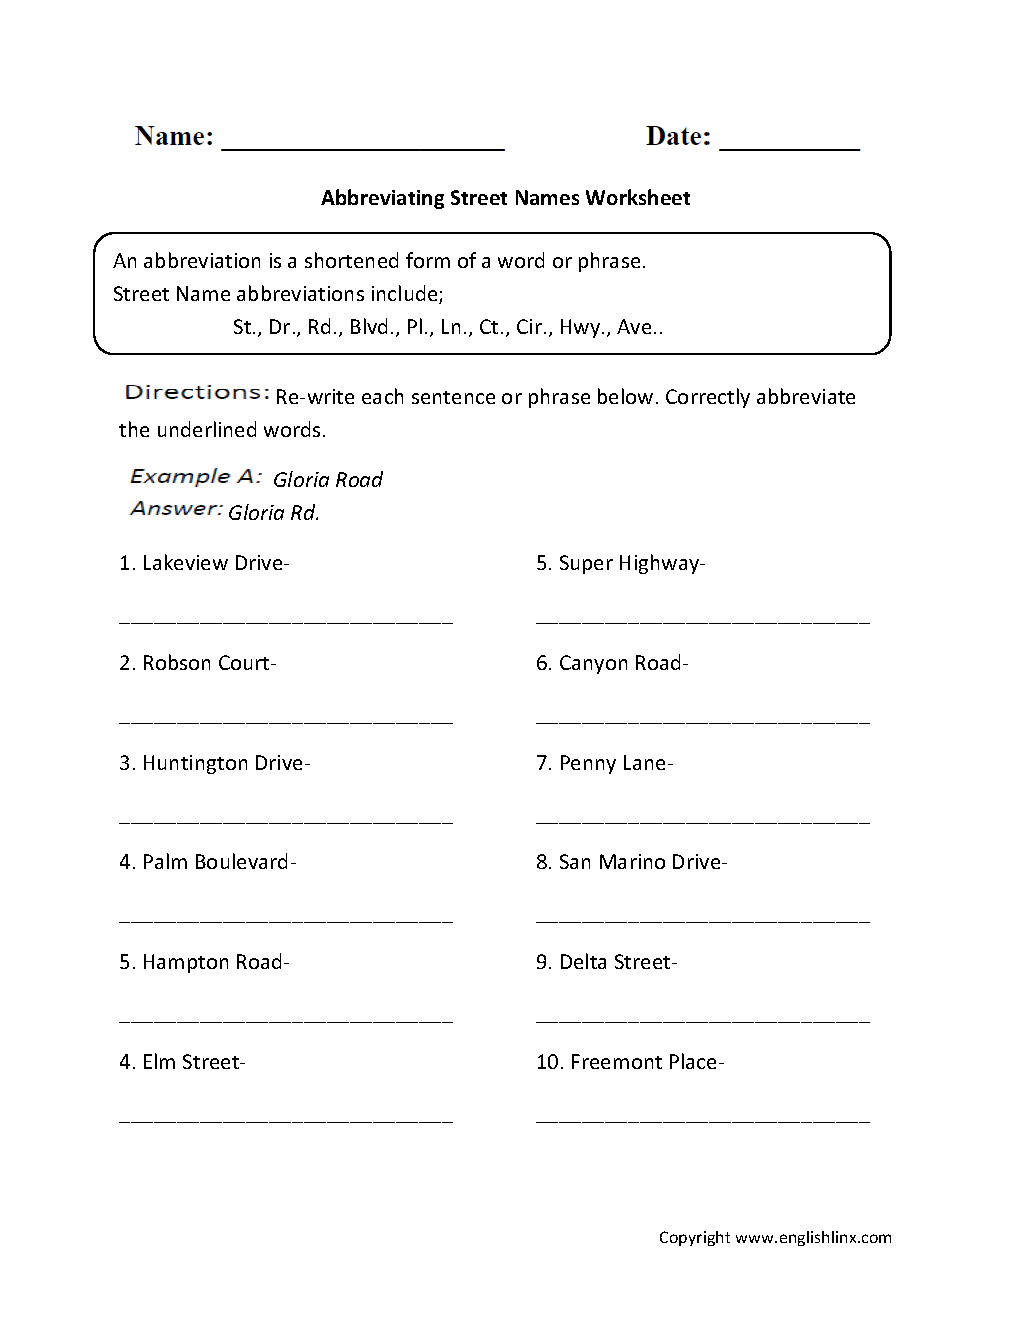 small resolution of Englishlinx.com   Abbreviations Worksheets   2nd grade worksheets